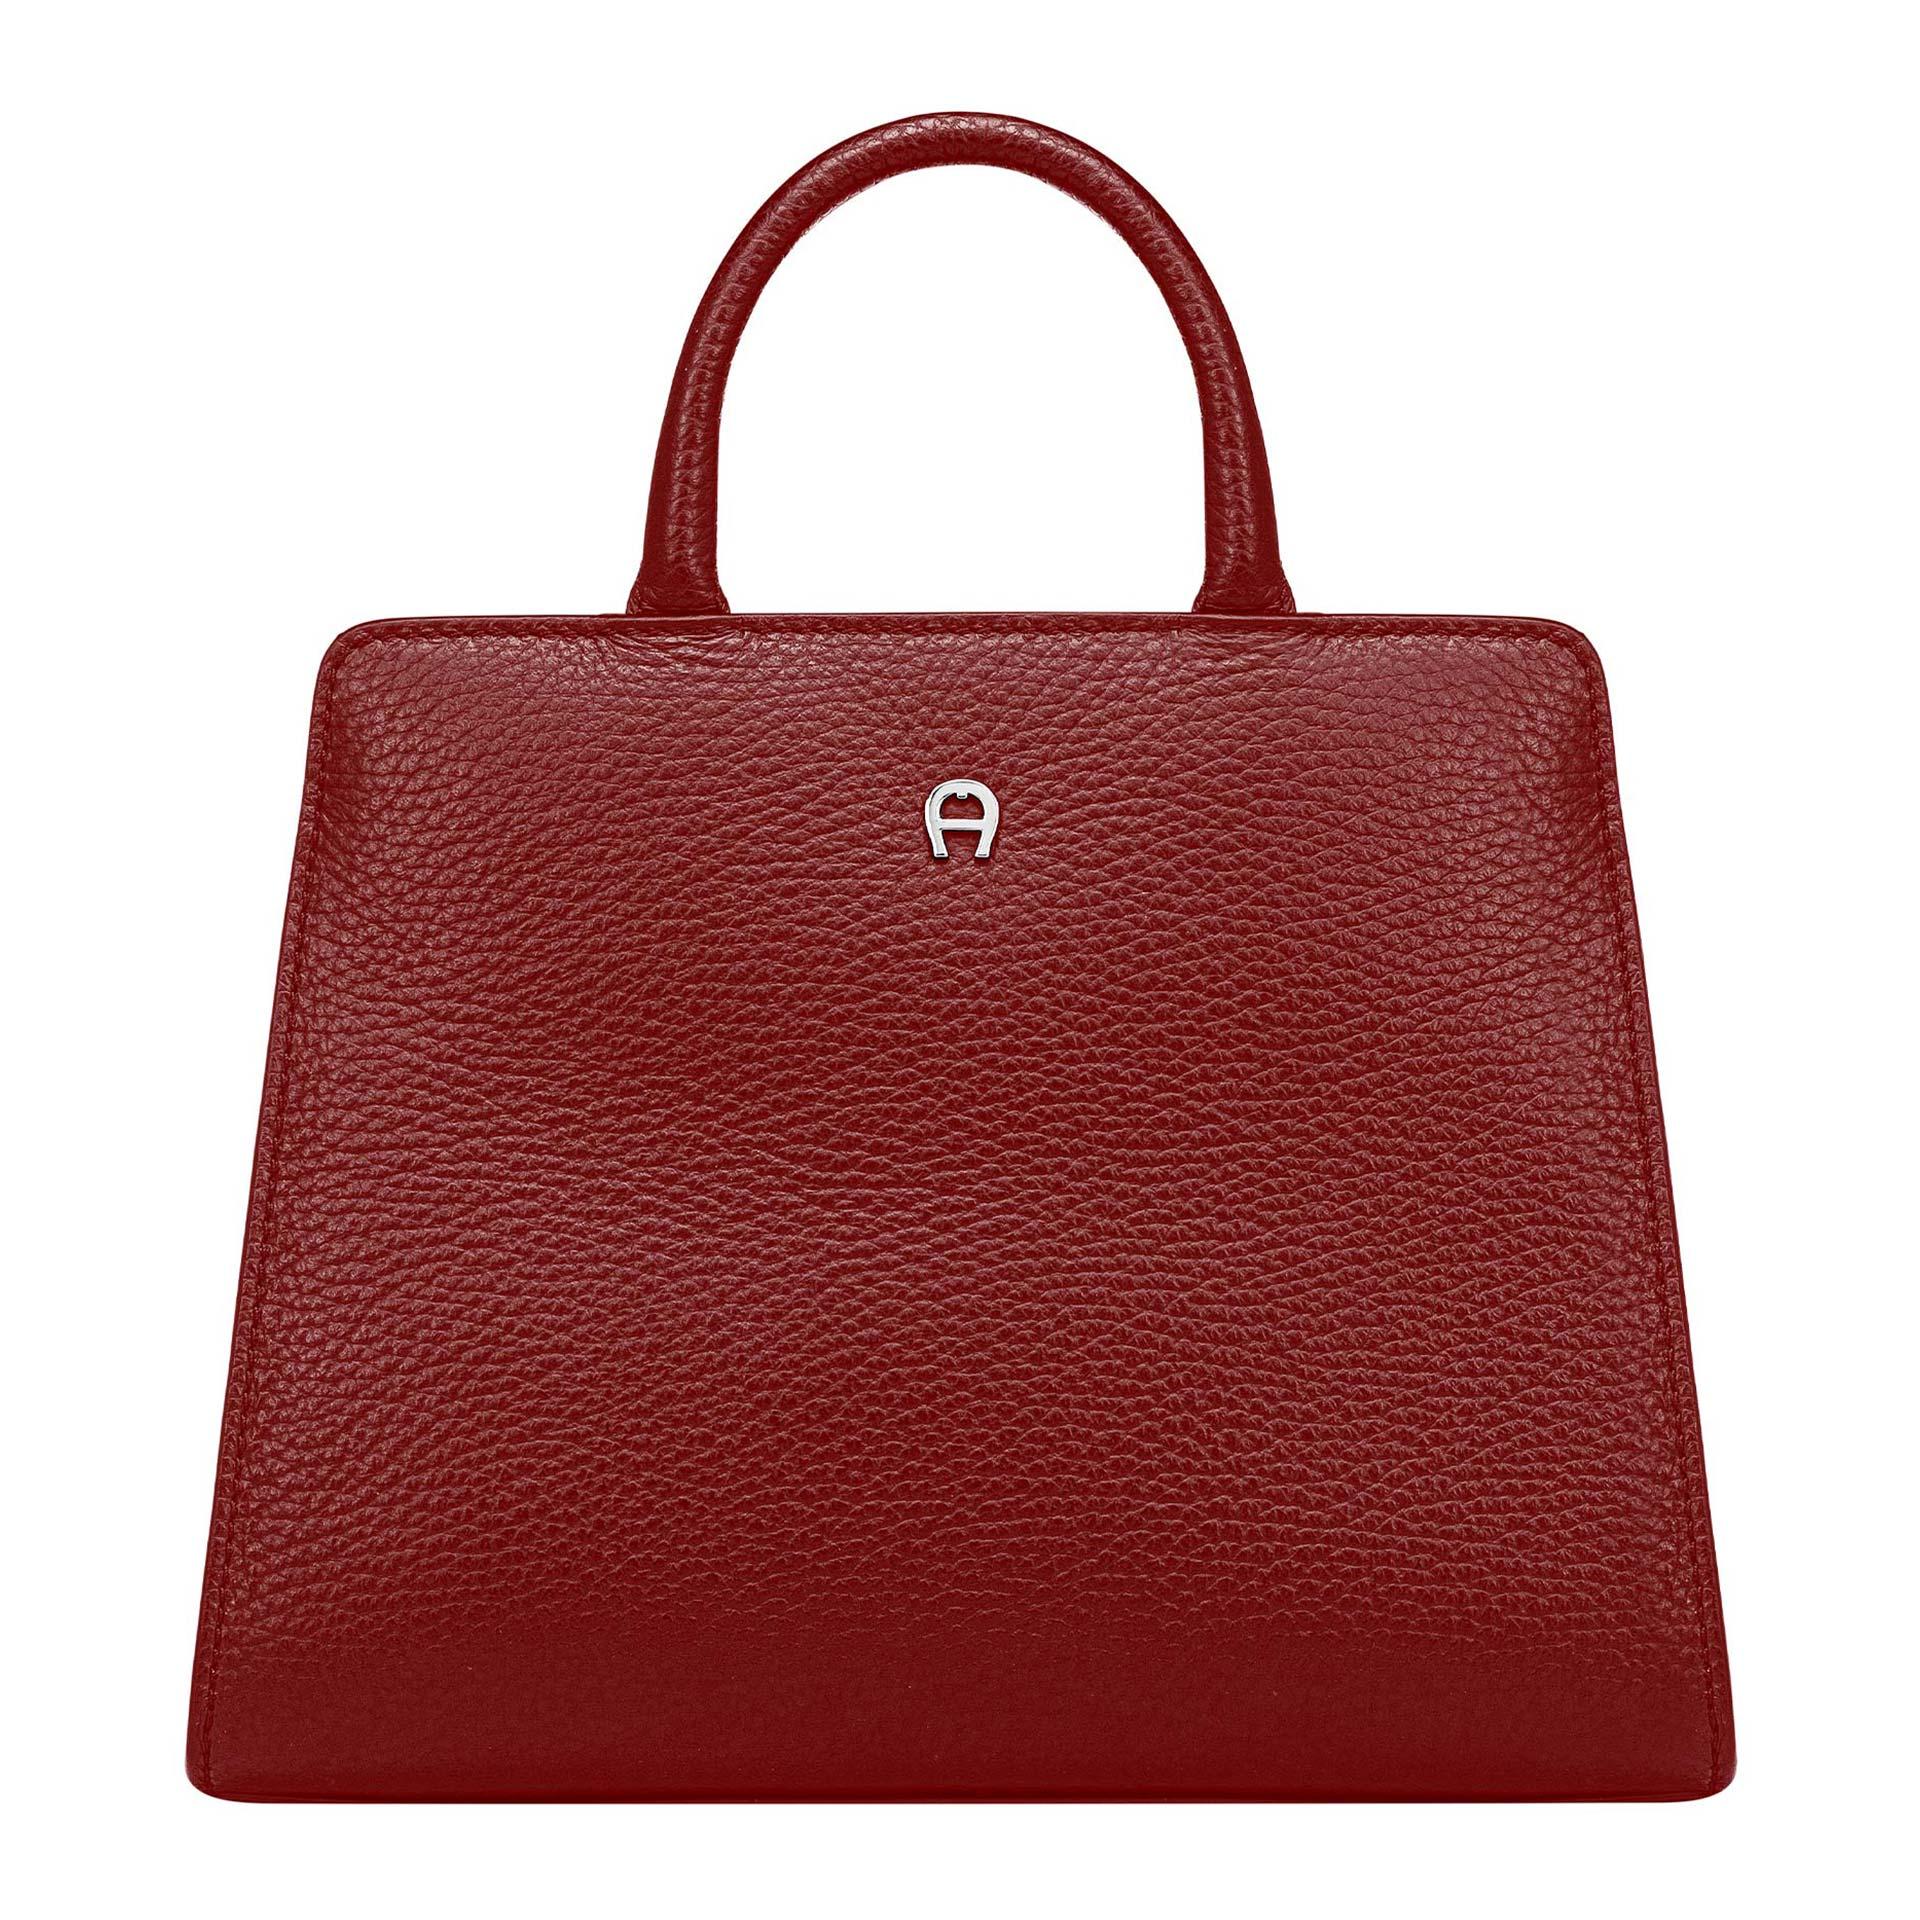 Aigner Cybill Handtasche XS burgundy